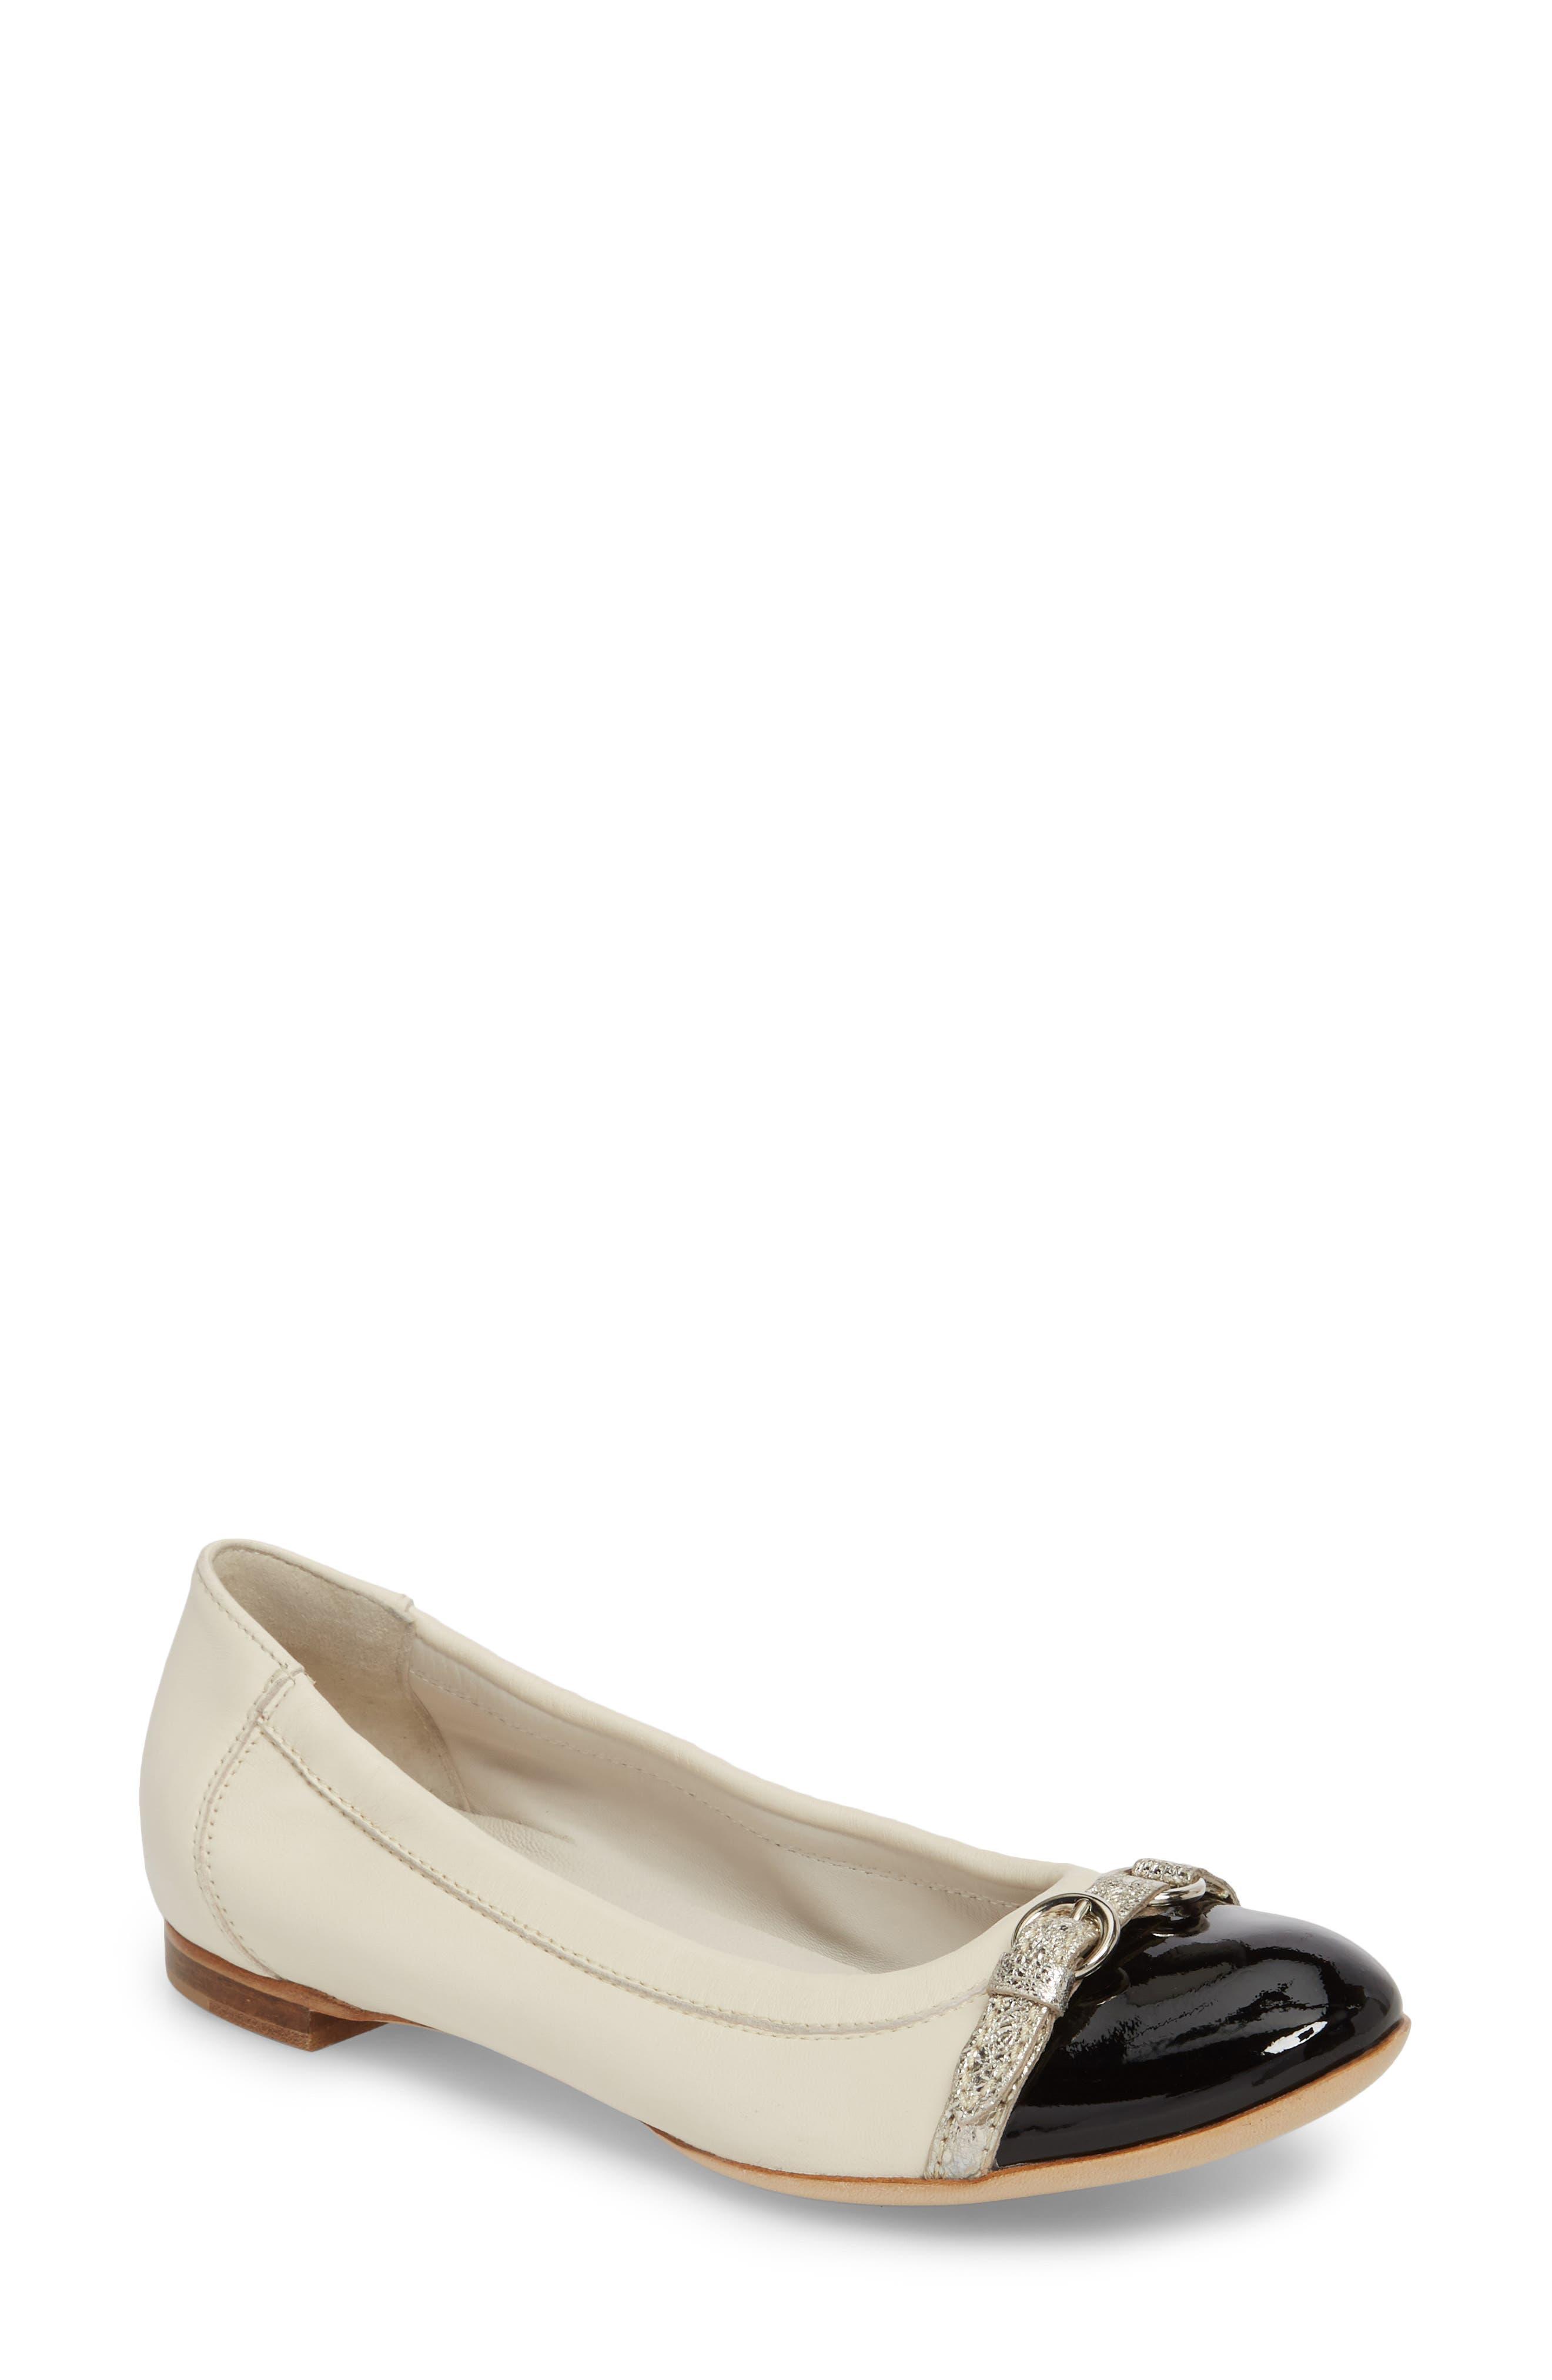 Alternate Image 1 Selected - AGL Cap Toe Ballet Flat (Women)